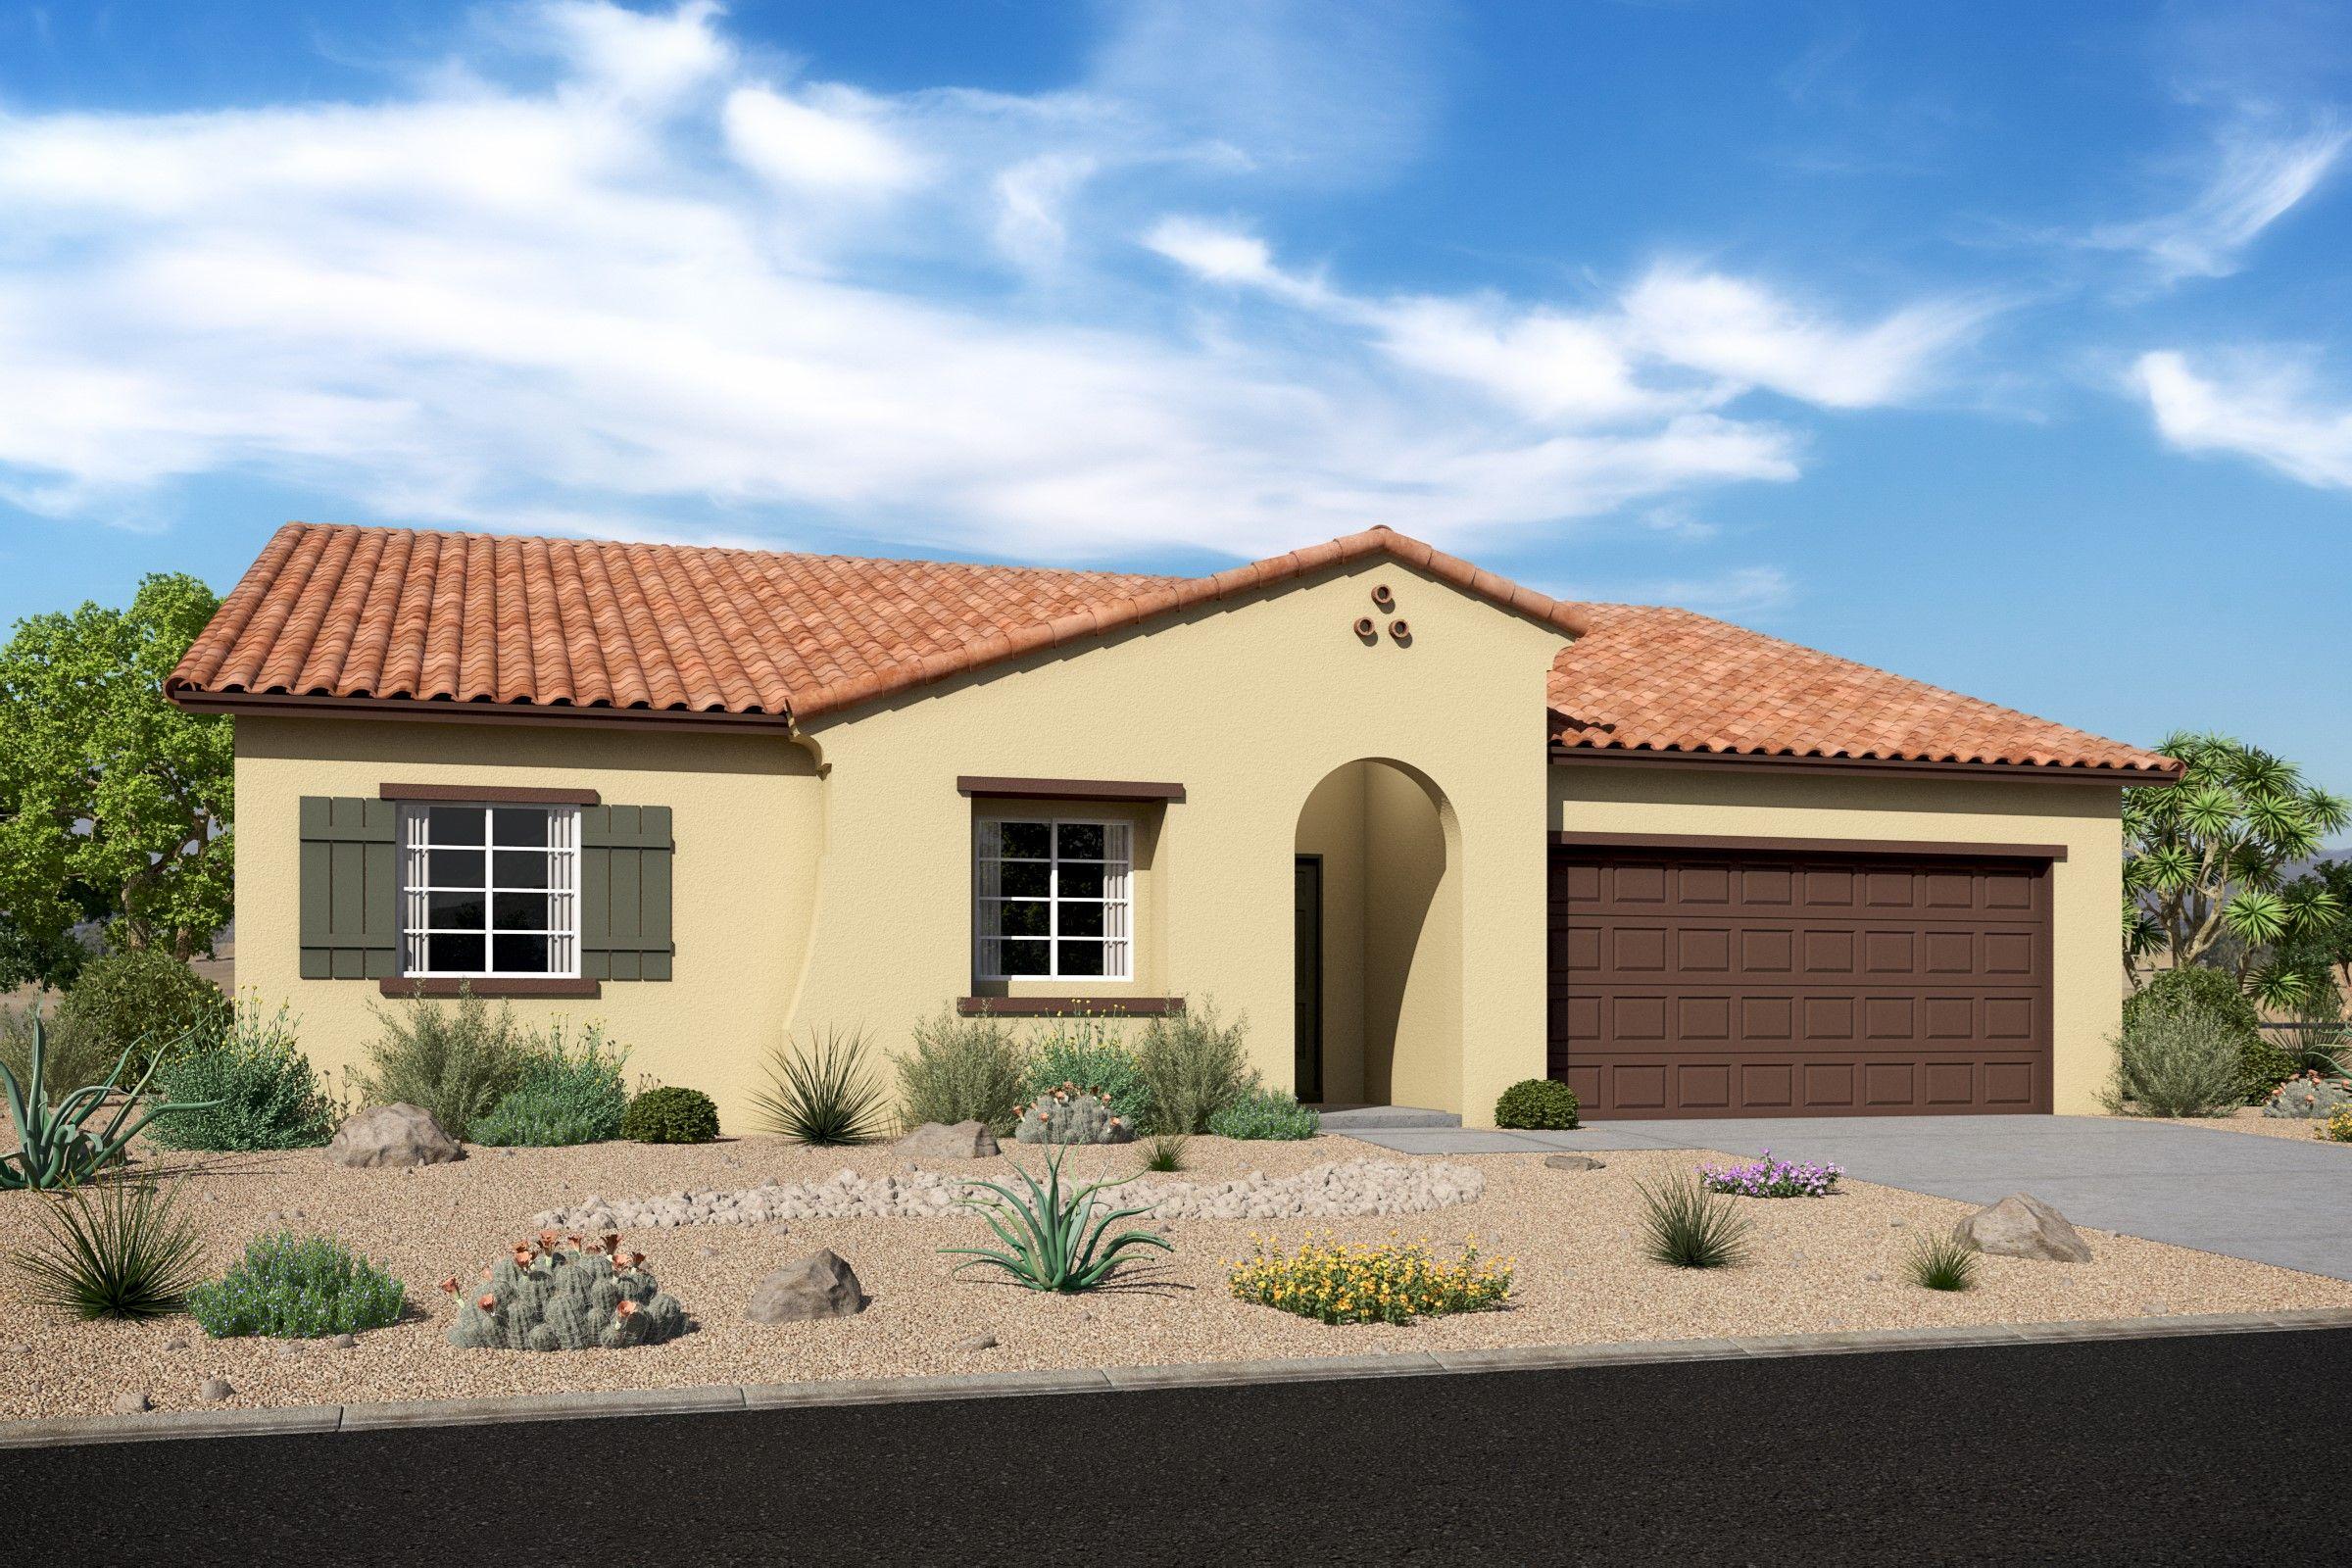 Single Family for Sale at Everest 309 East Atlantic Drive, Homesite 31 Casa Grande, Arizona 85122 United States